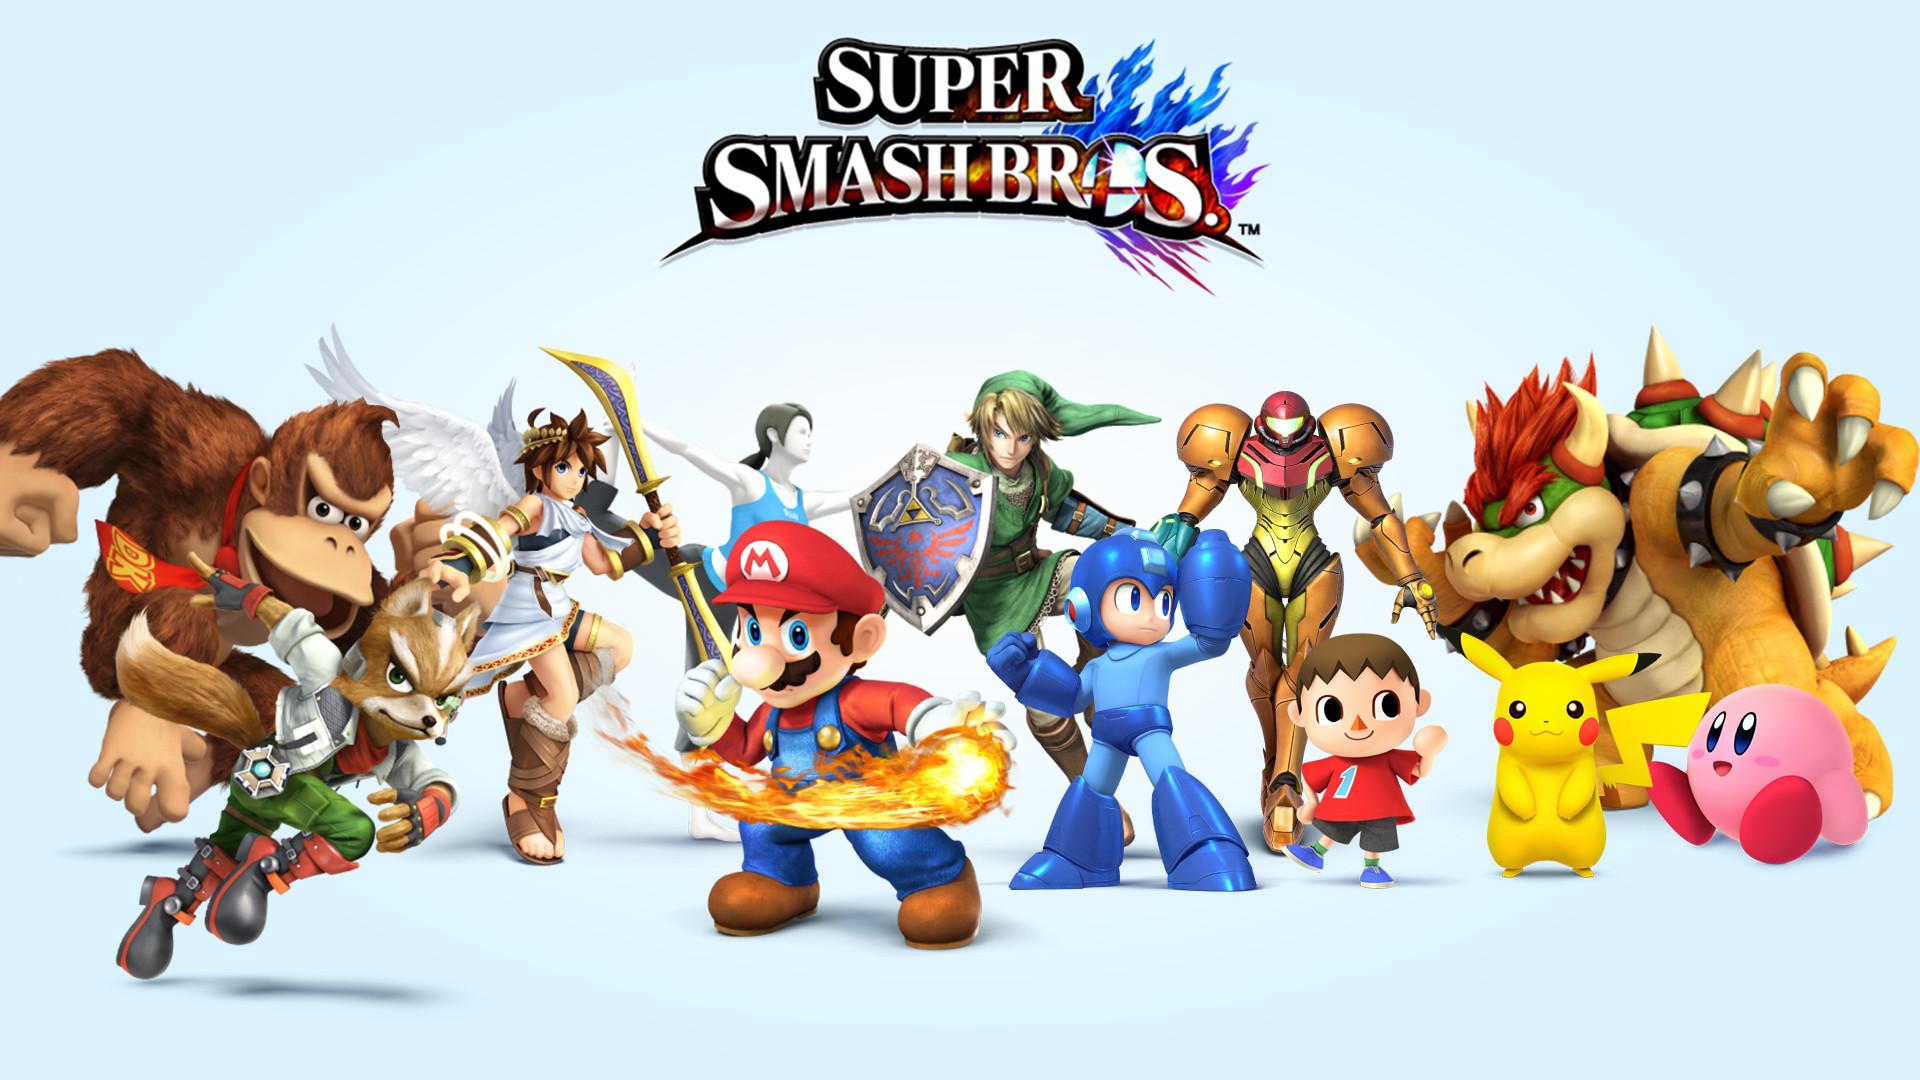 49+] Smash Bros Wallpaper Reddit on WallpaperSafari